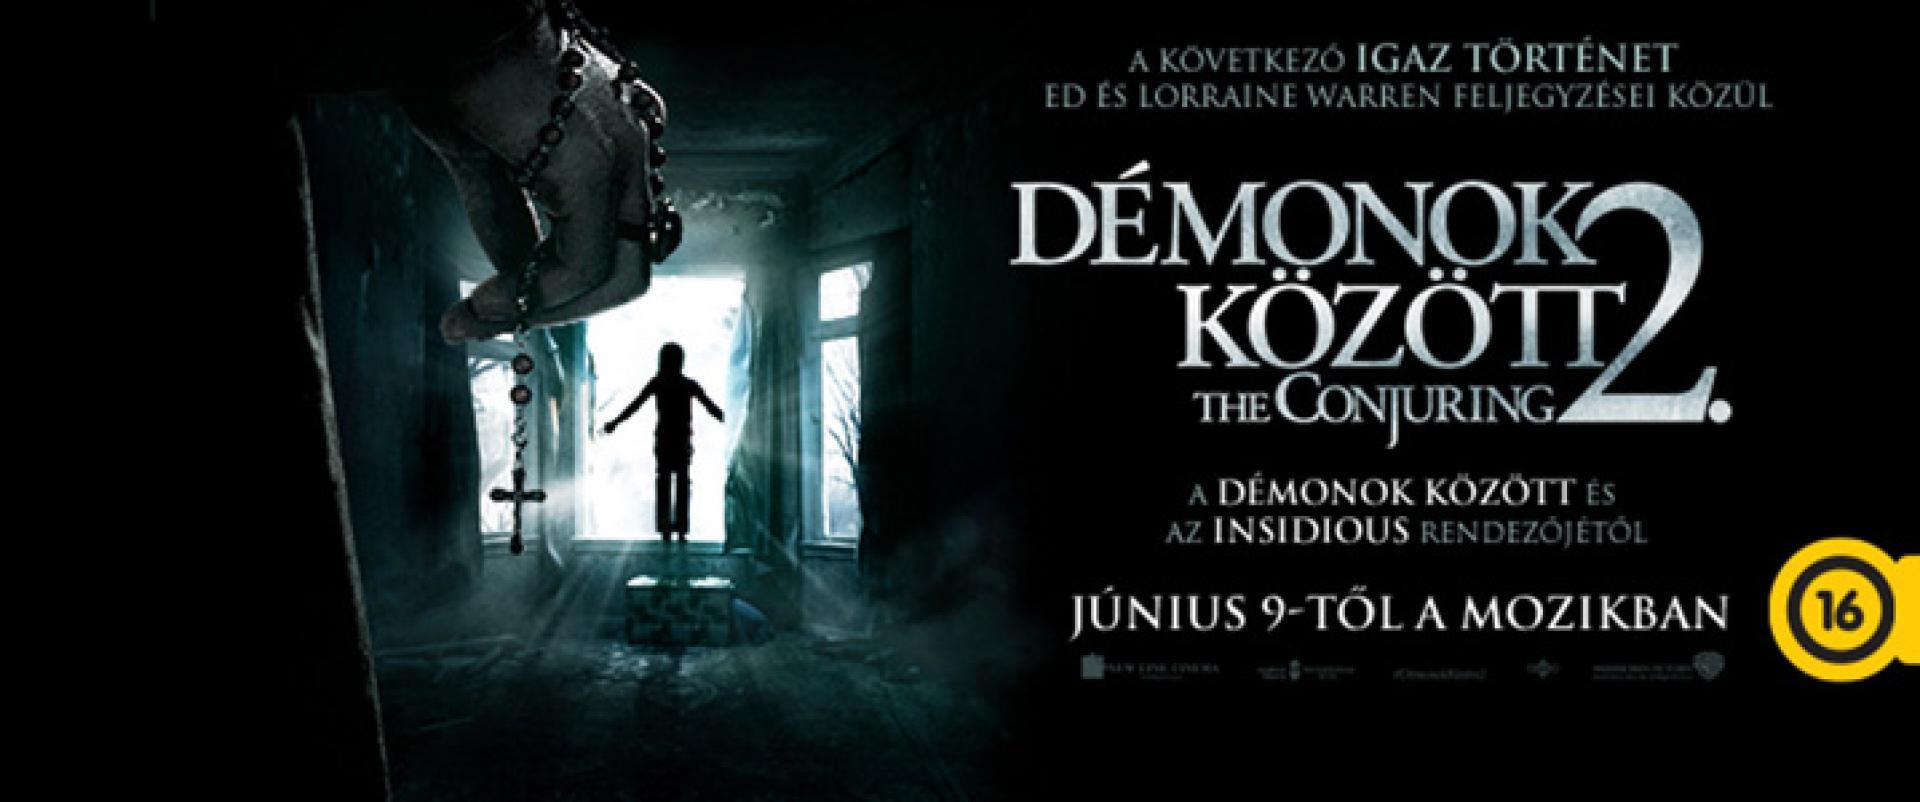 The Conjuring 2 - Démonok között 2. (2016)